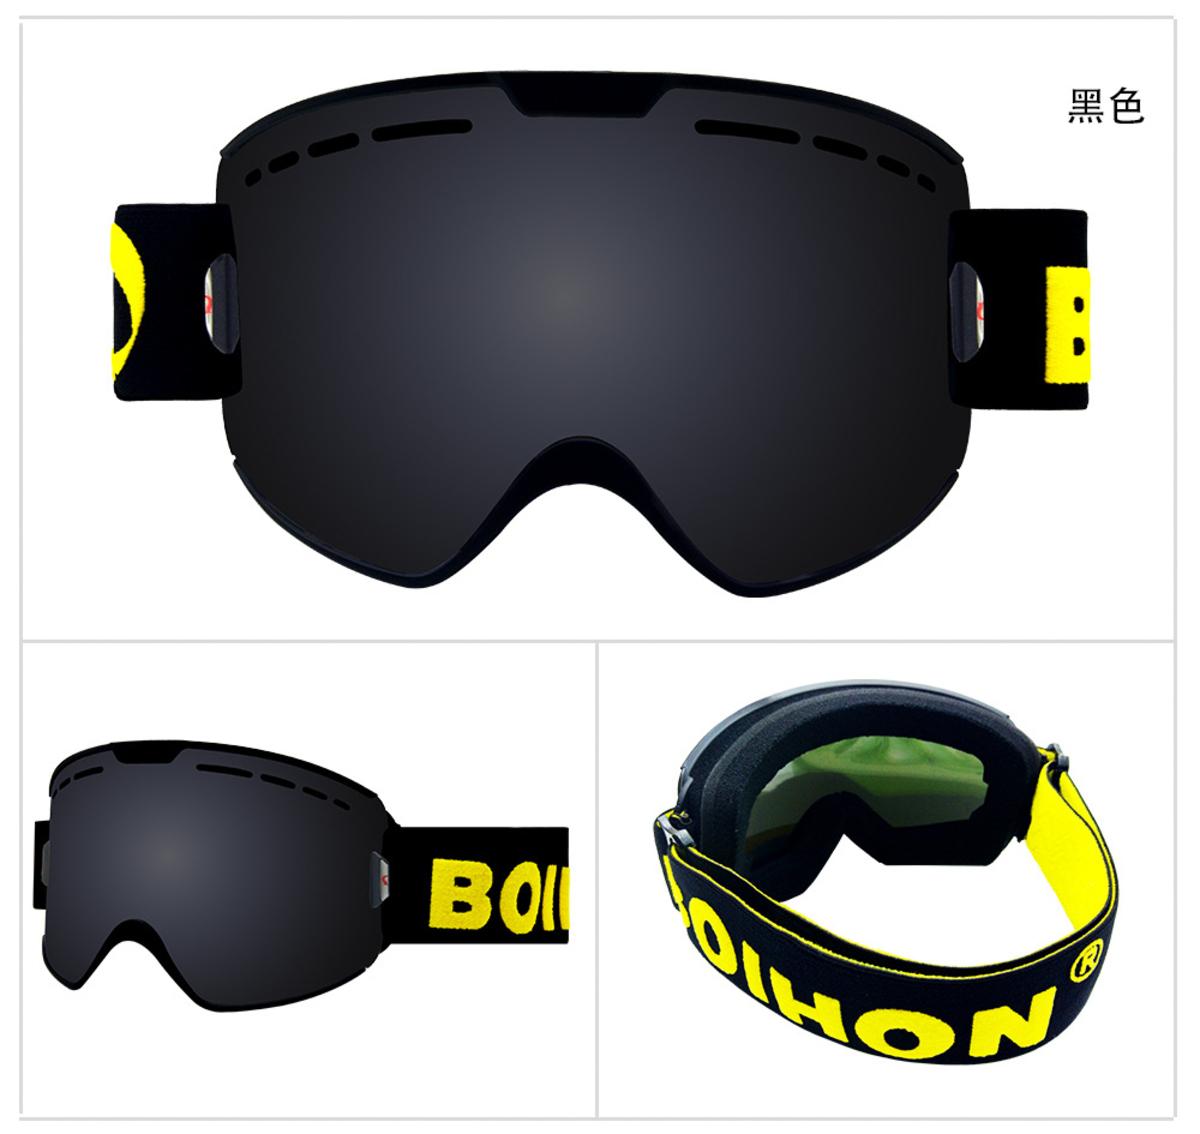 BOIHON 戶外防風滑雪鏡 BH512 (黑色)